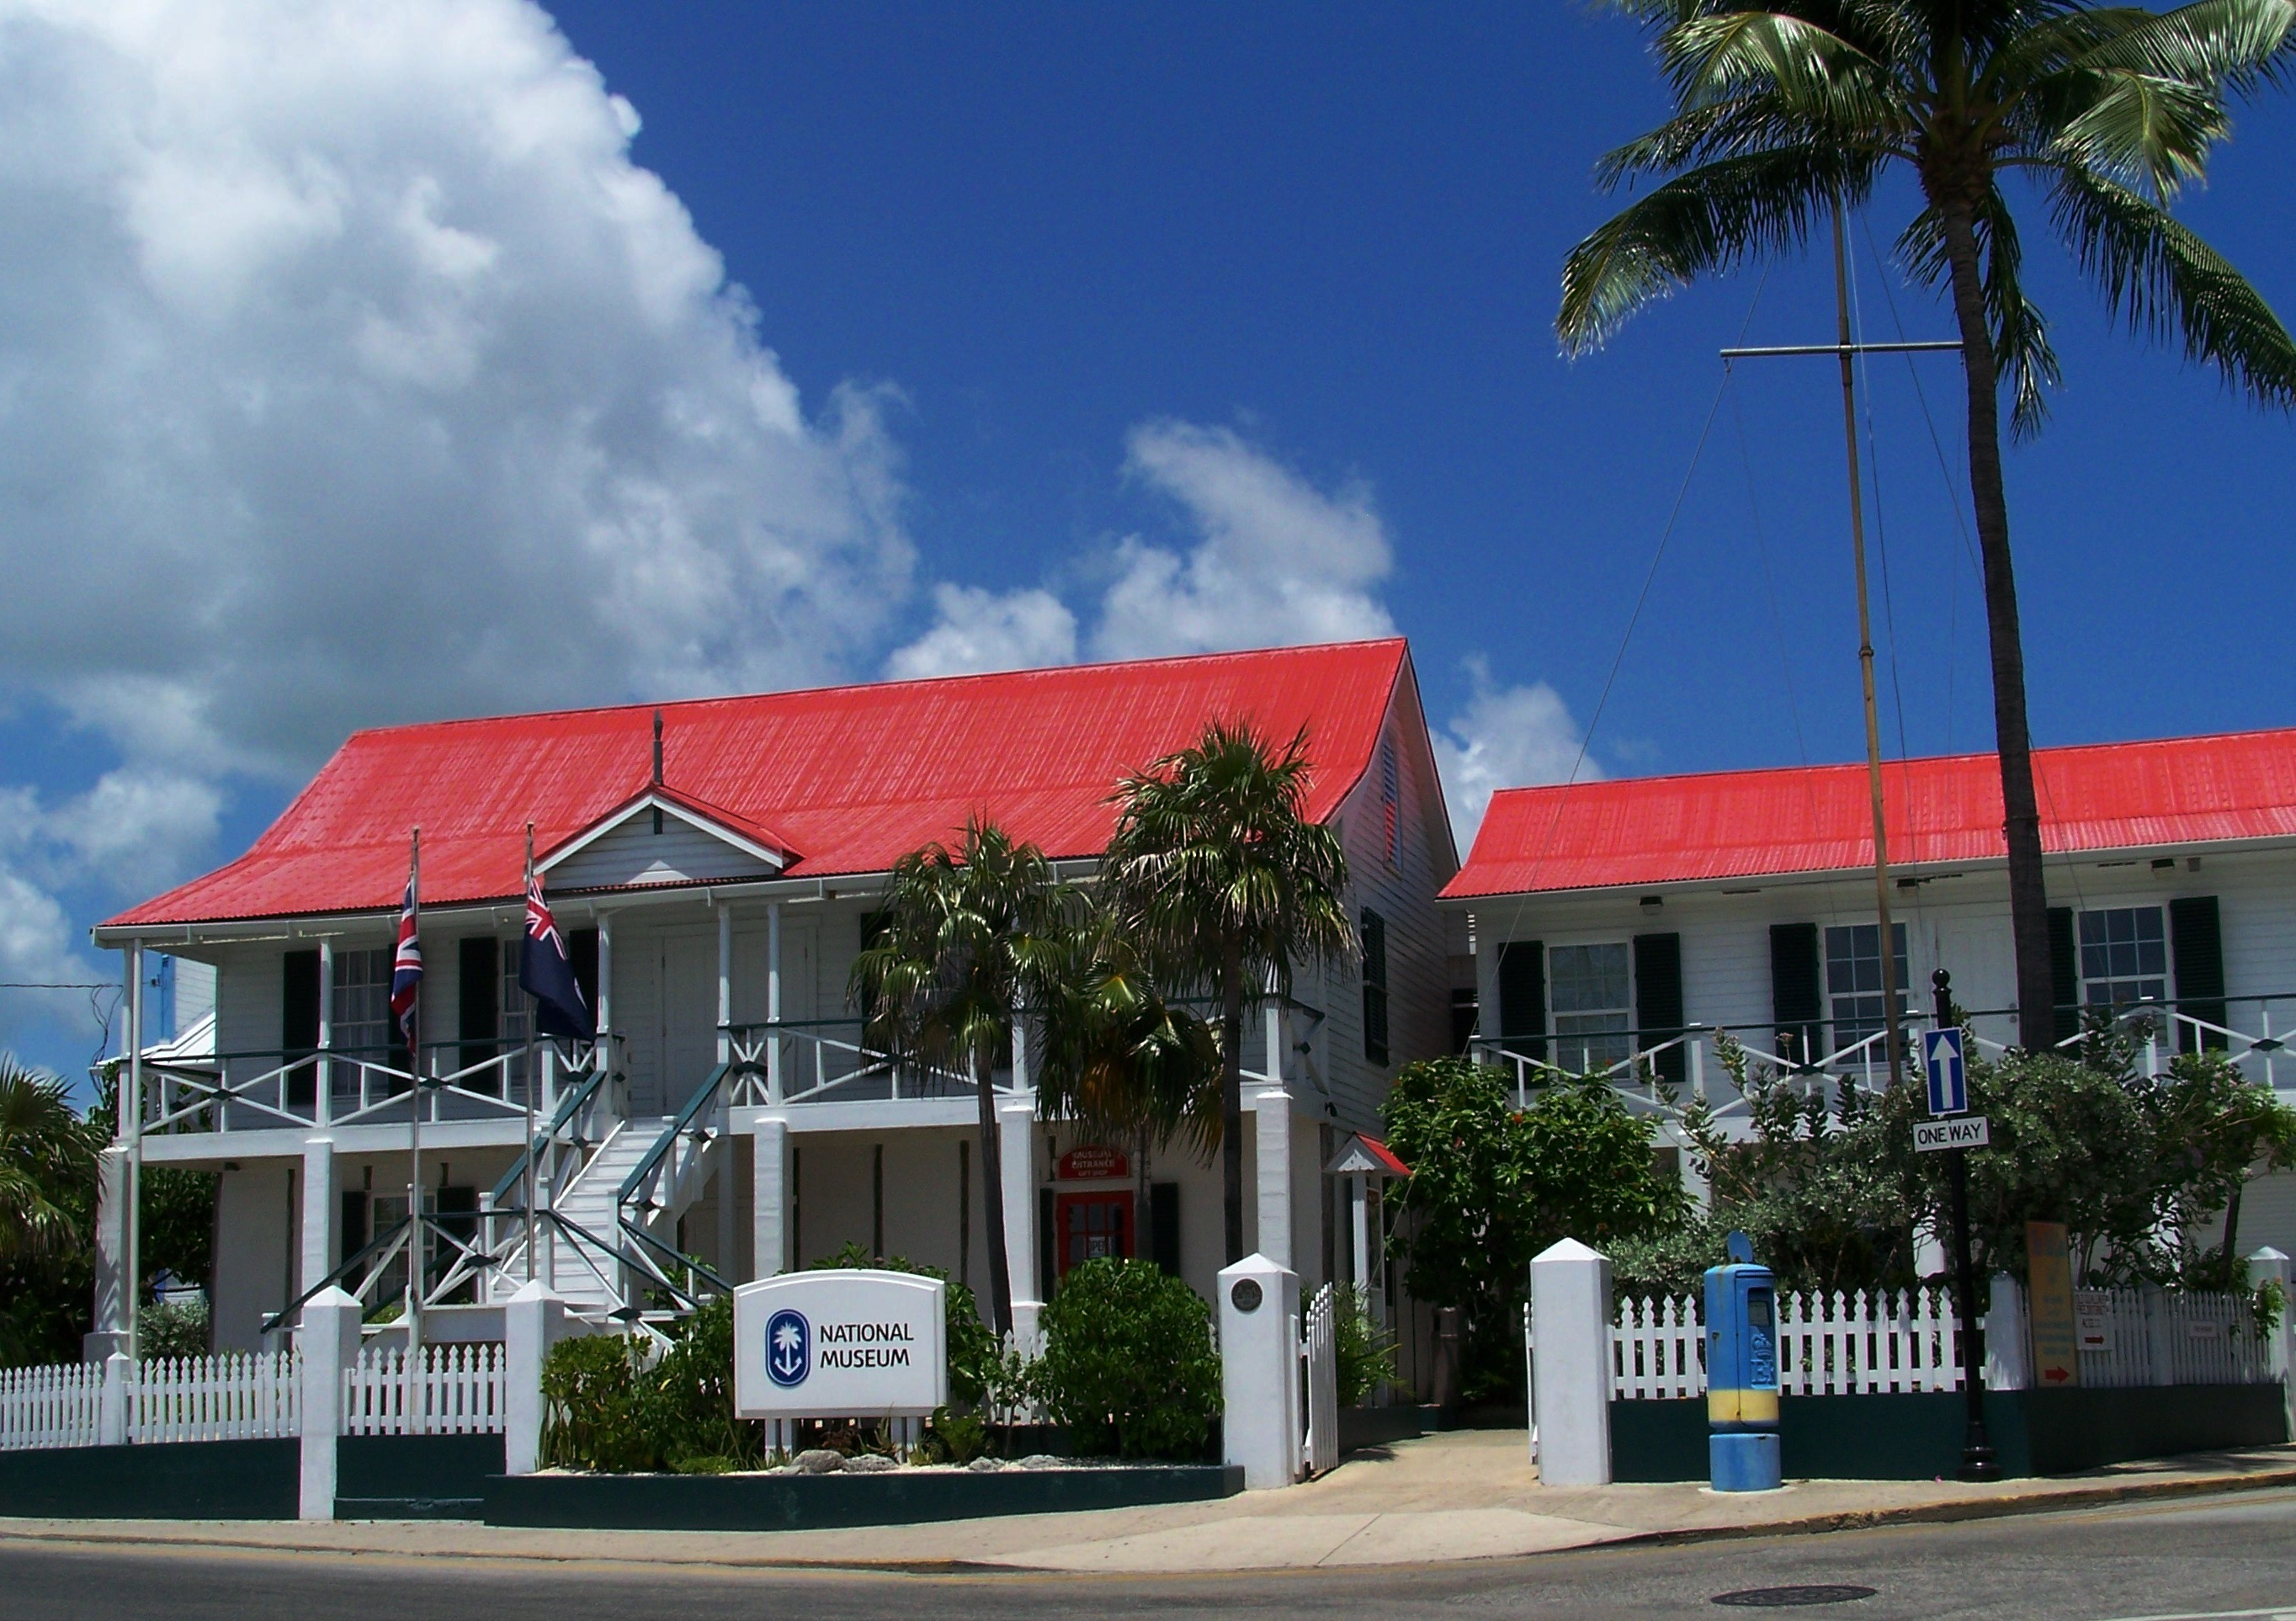 Hospital Georgetown Cayman Islands